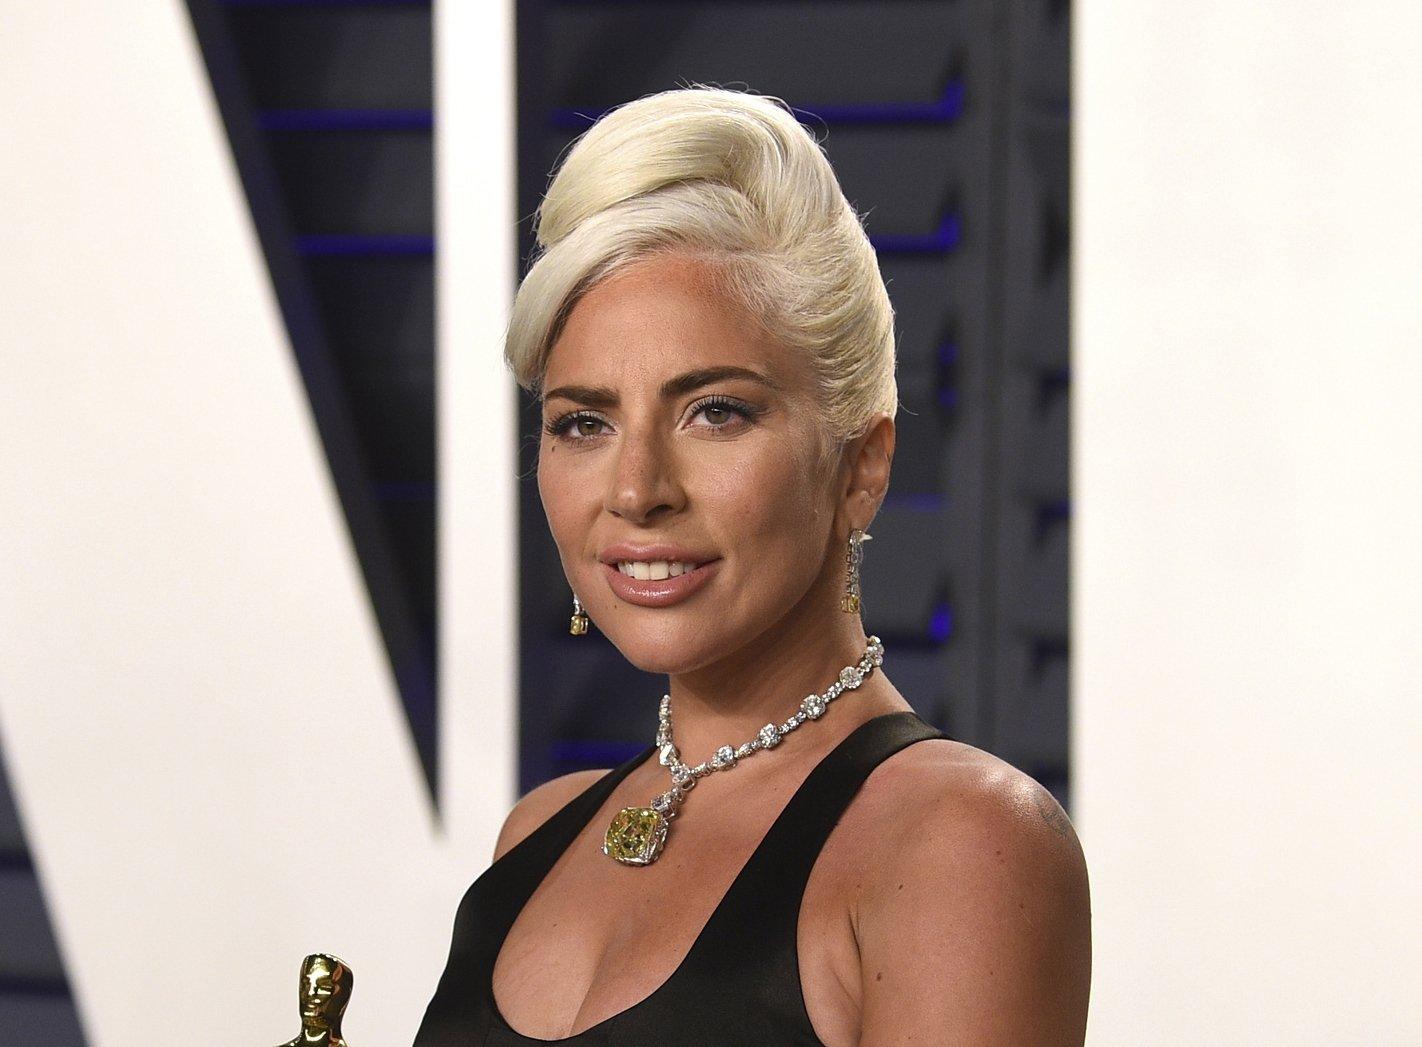 Lady Gaga, winner of the award for best original song